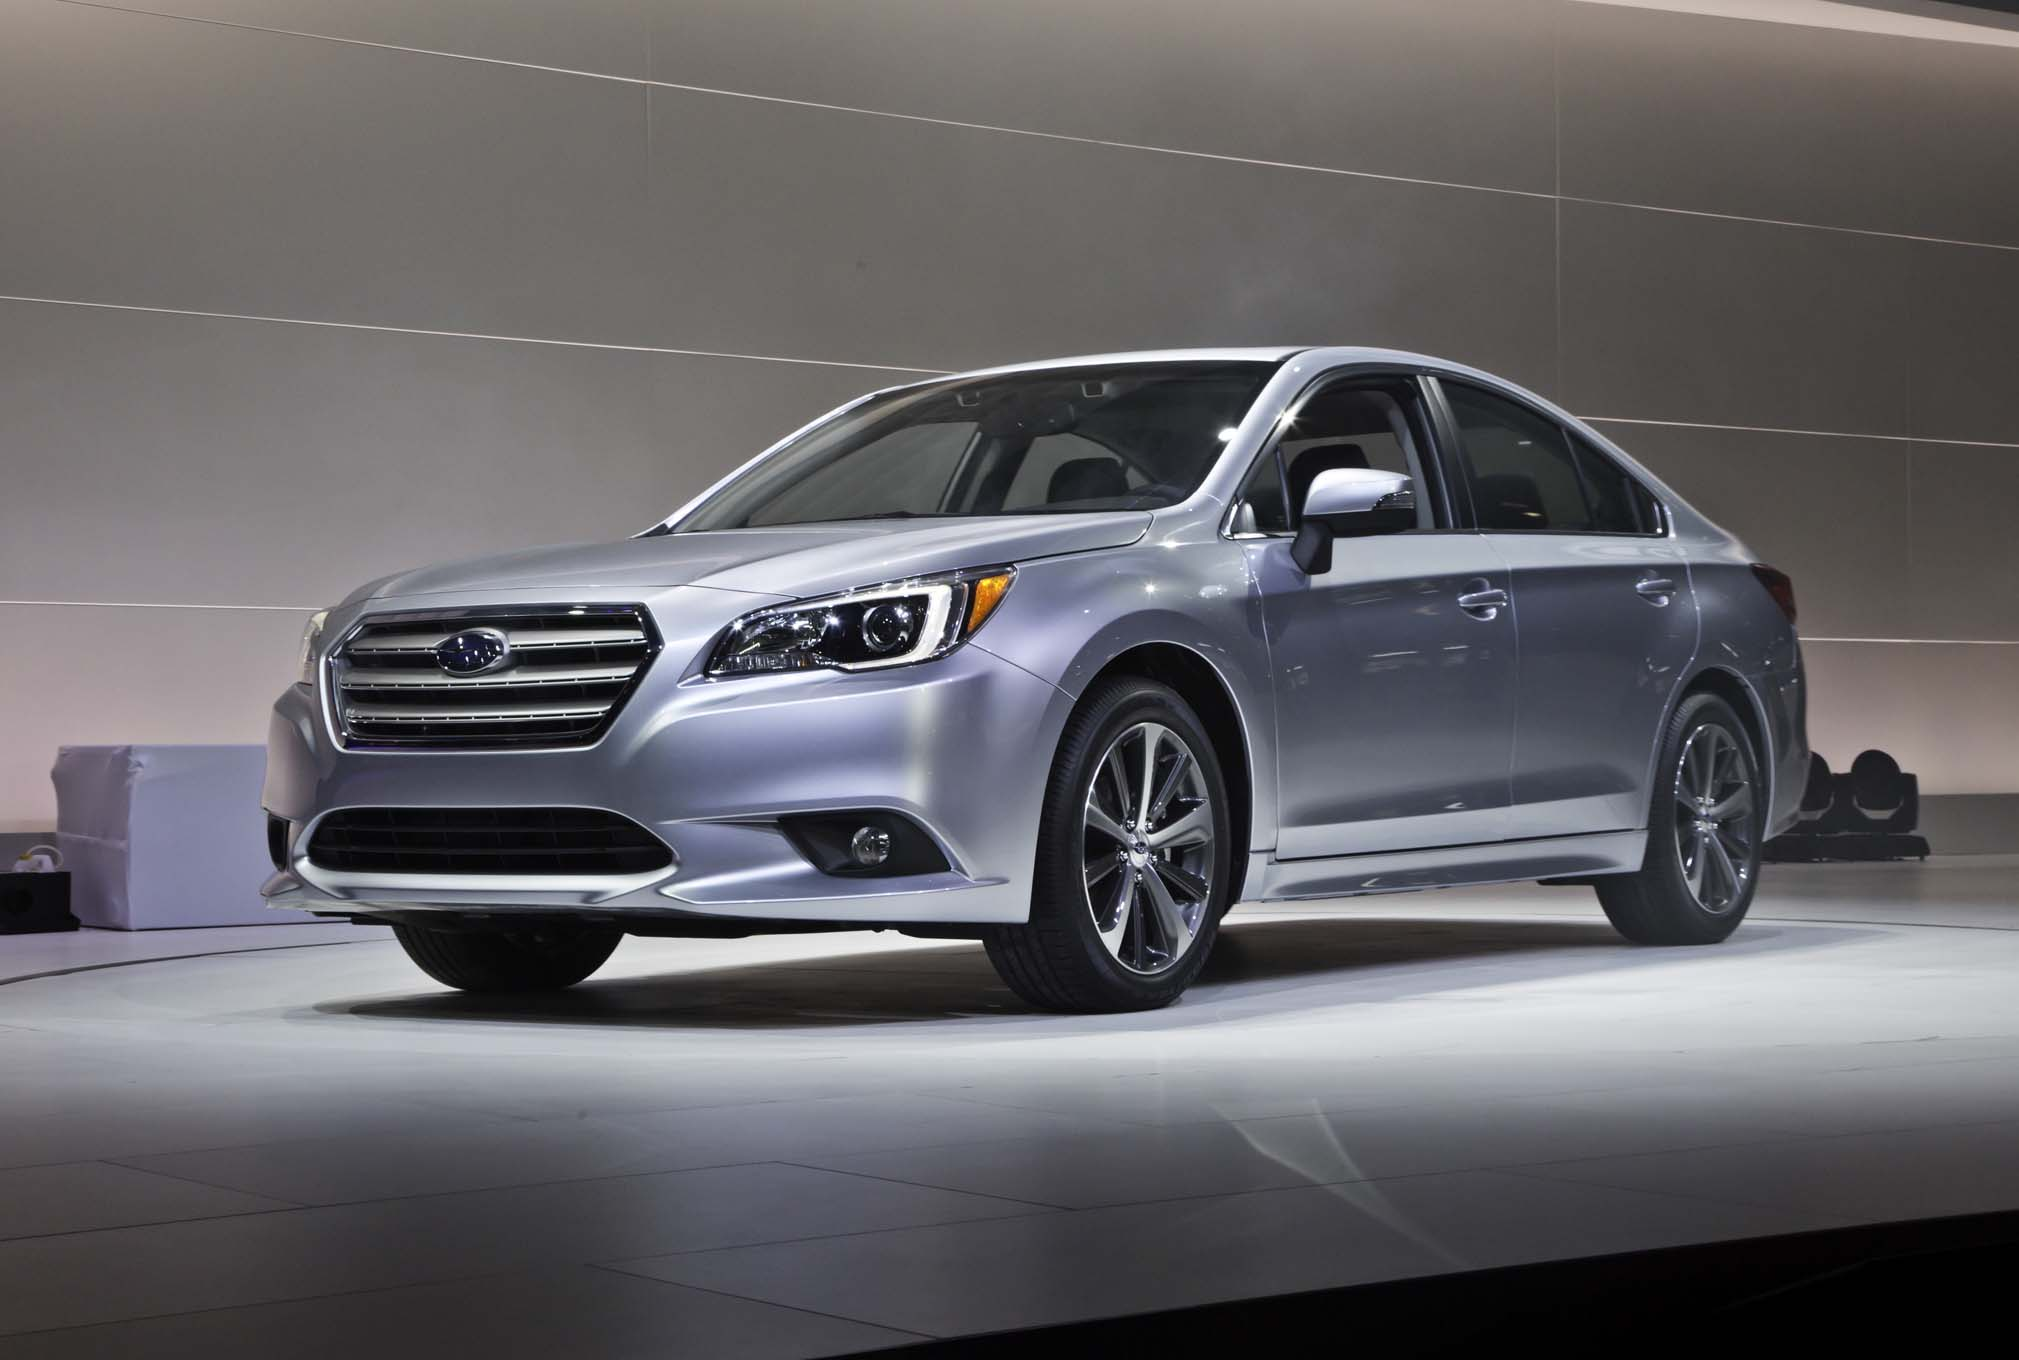 2015 Subaru Legacy Front Three Quarters 031